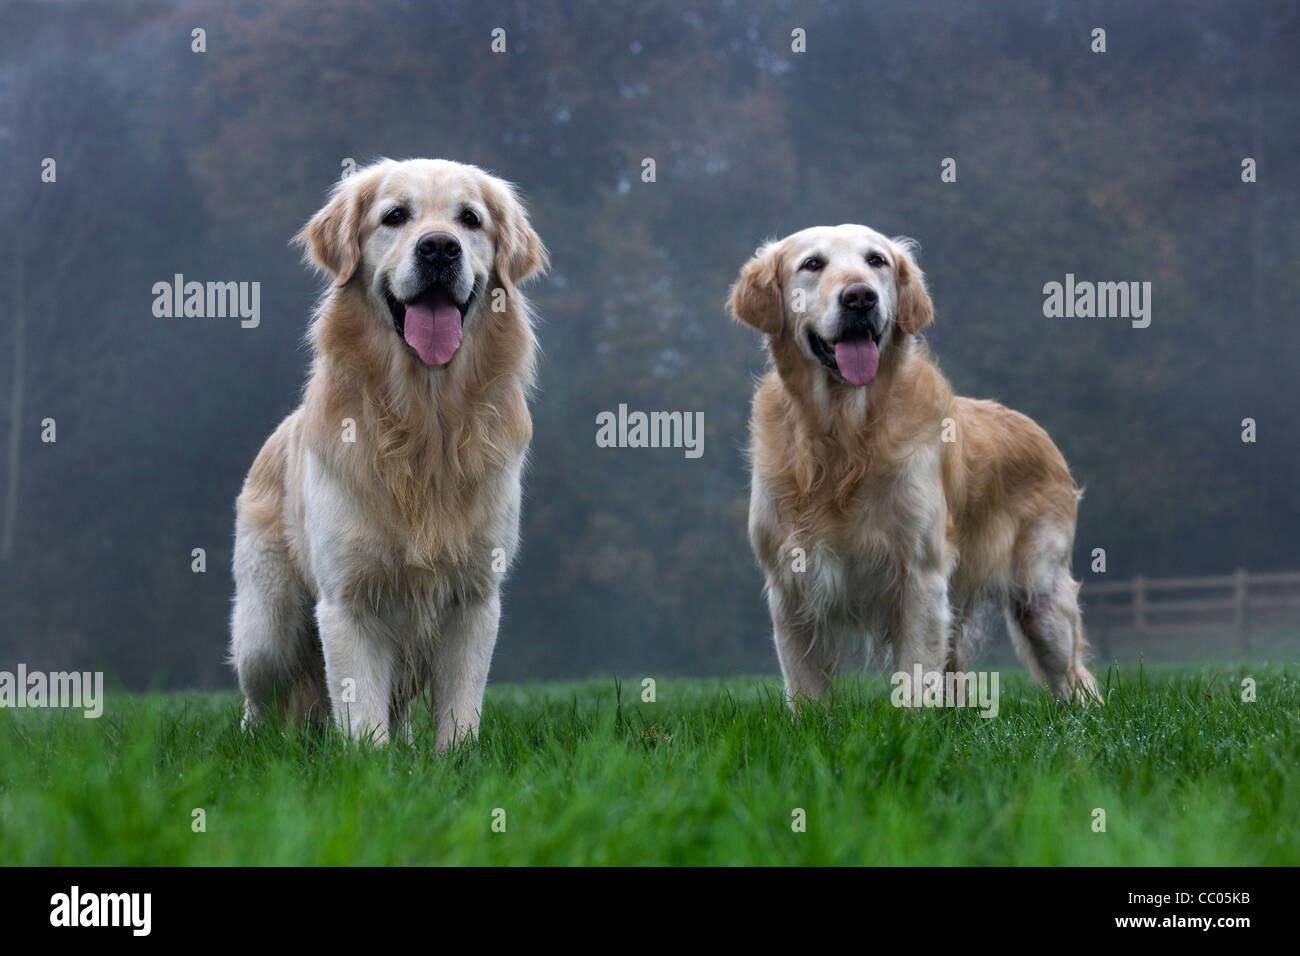 Couple Golden retrievers in garden - Stock Image